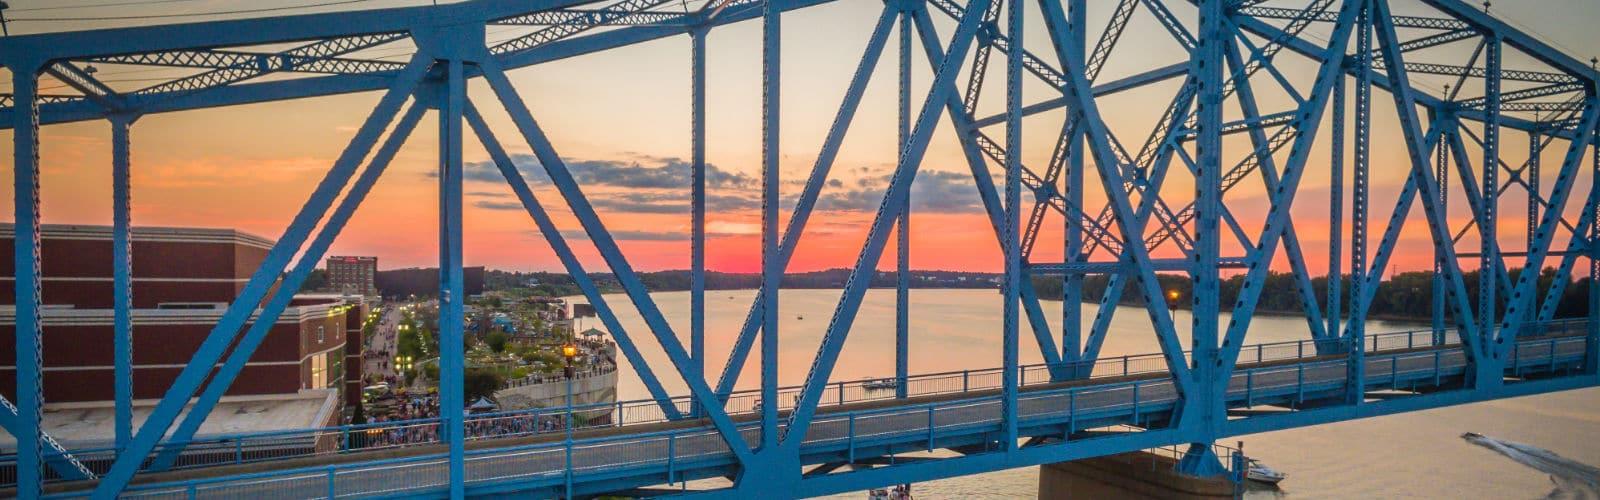 Inside – Bridge at Sunset